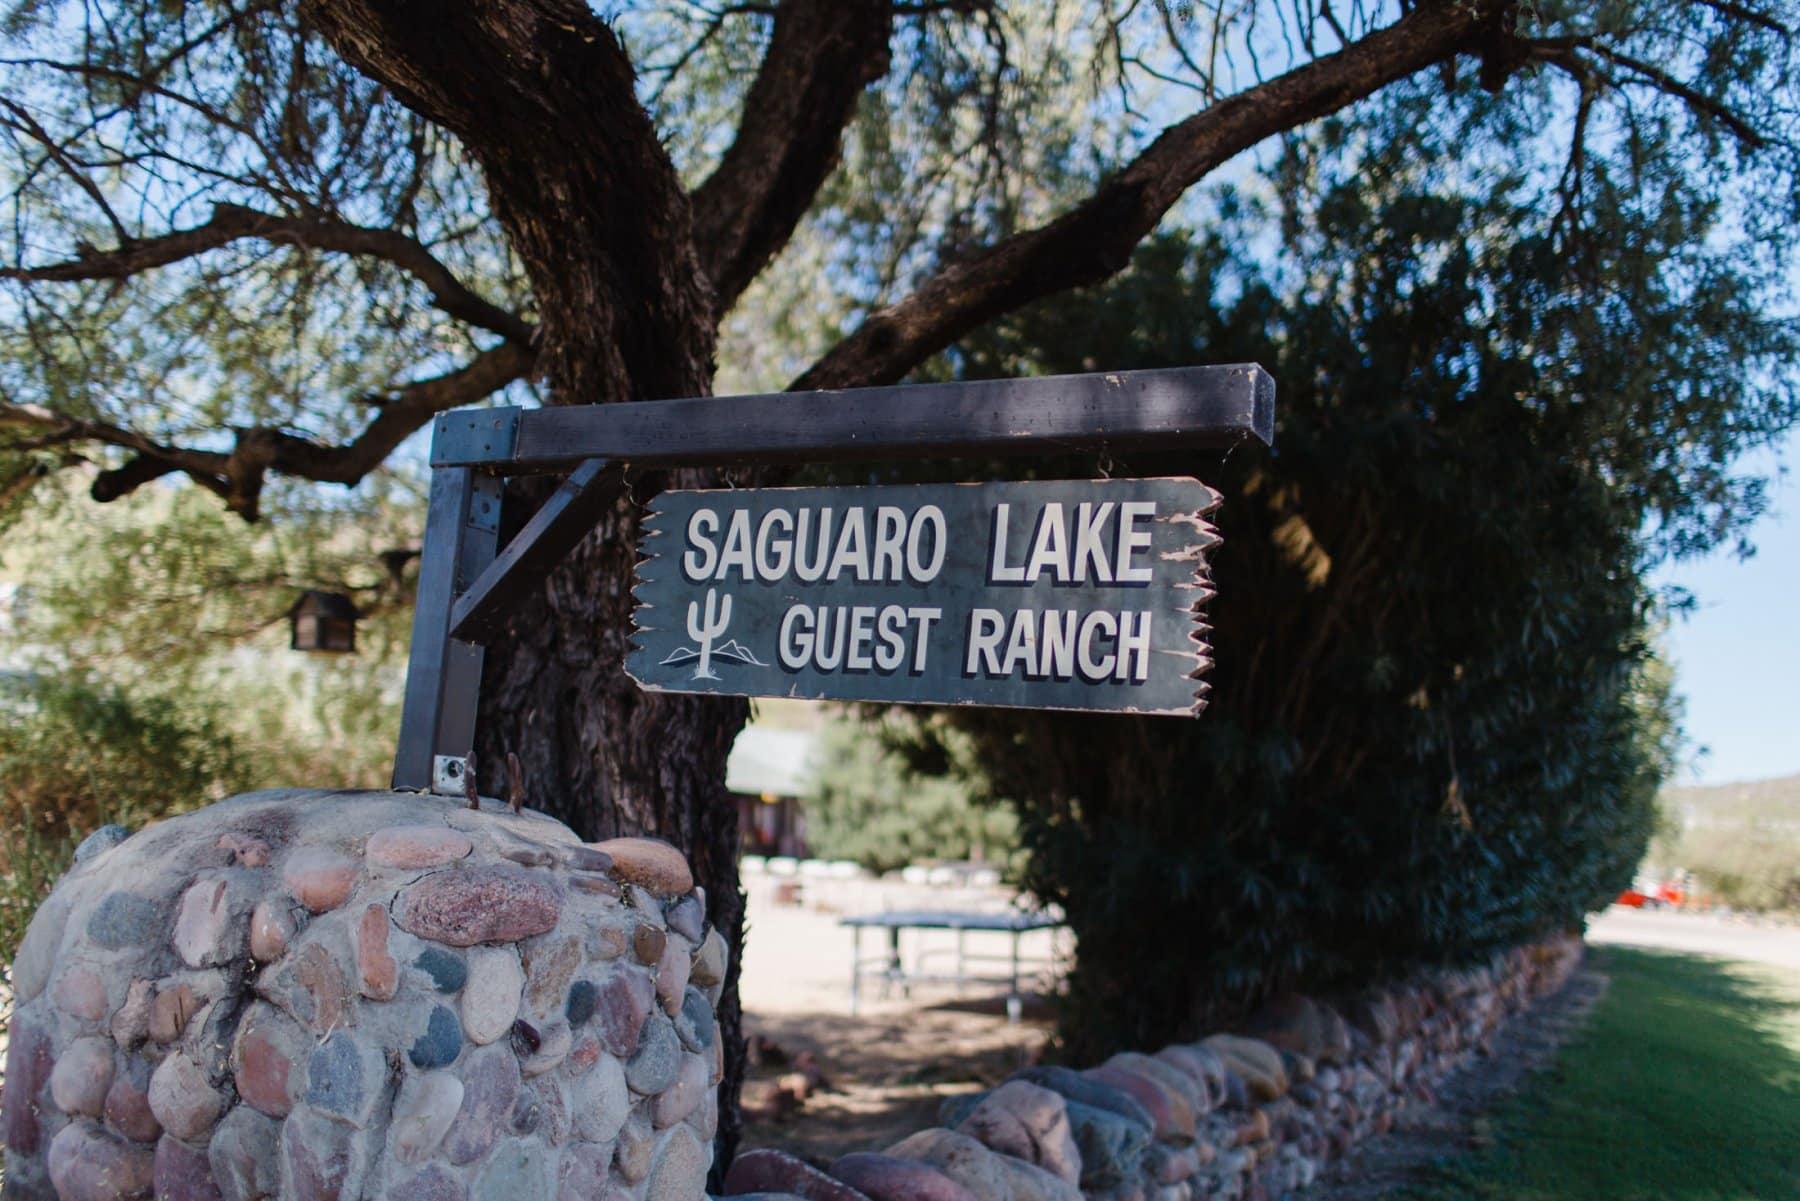 Saguaro Lake Guest Ranch sign